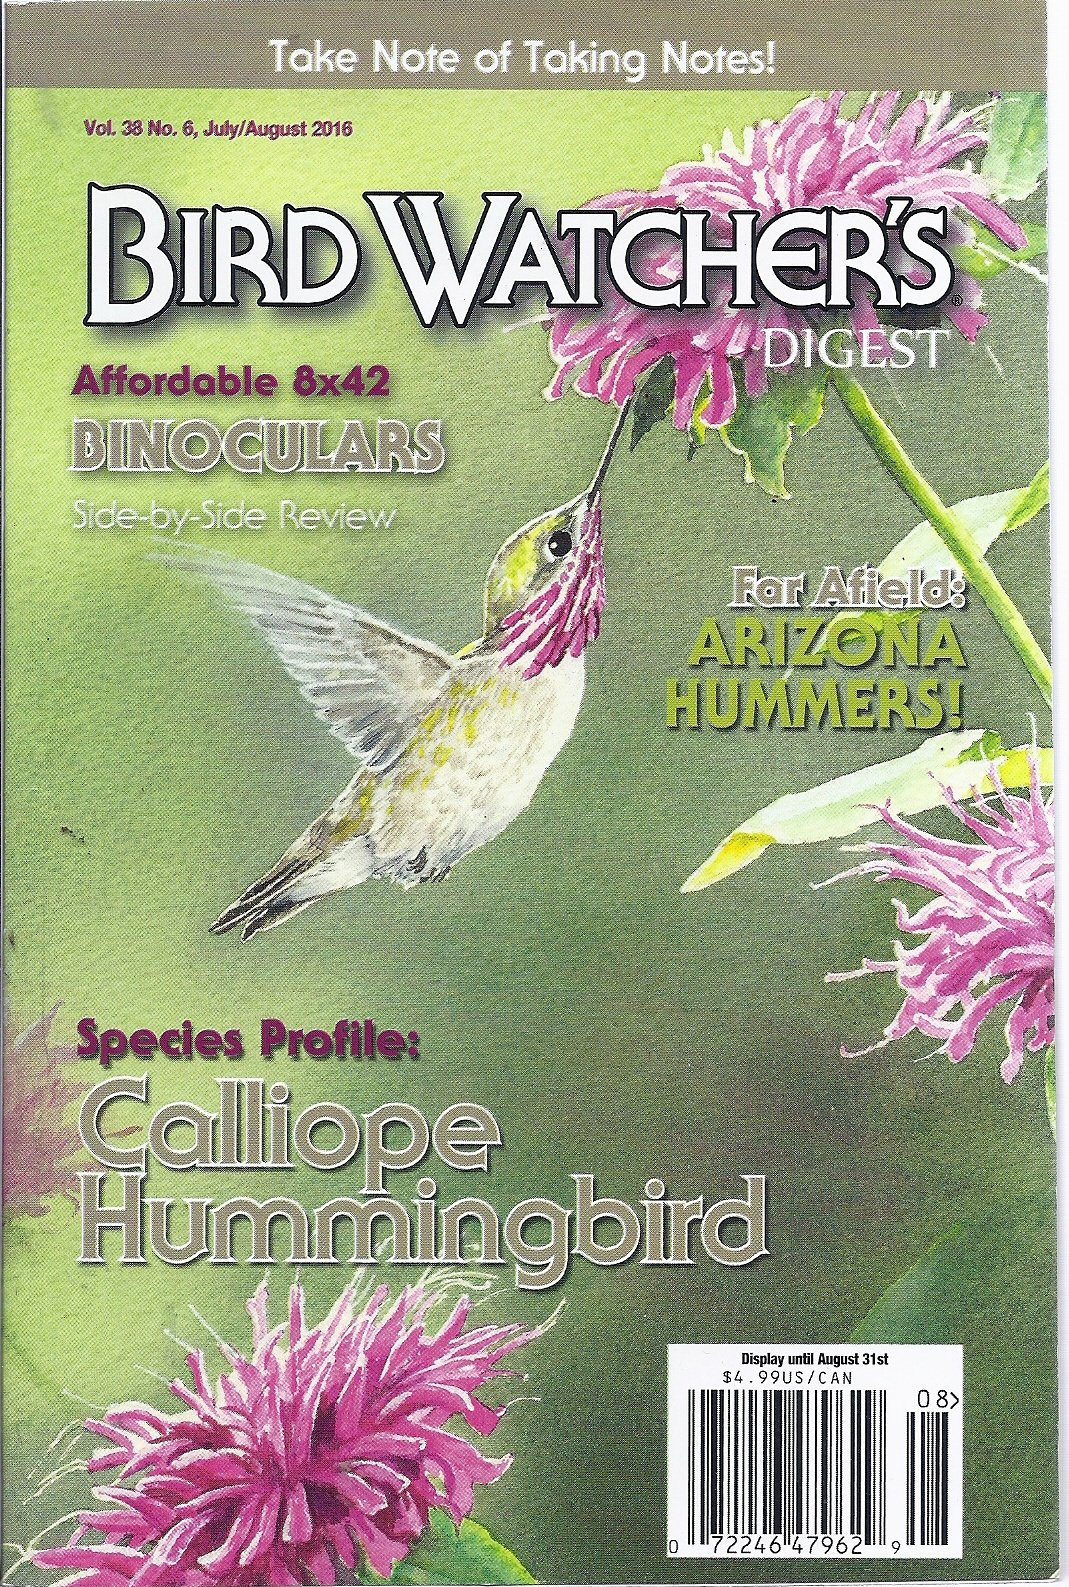 Bird Watcher's Digest (July/August 2016 - Special Profile: Calliope Hummingbird) PDF